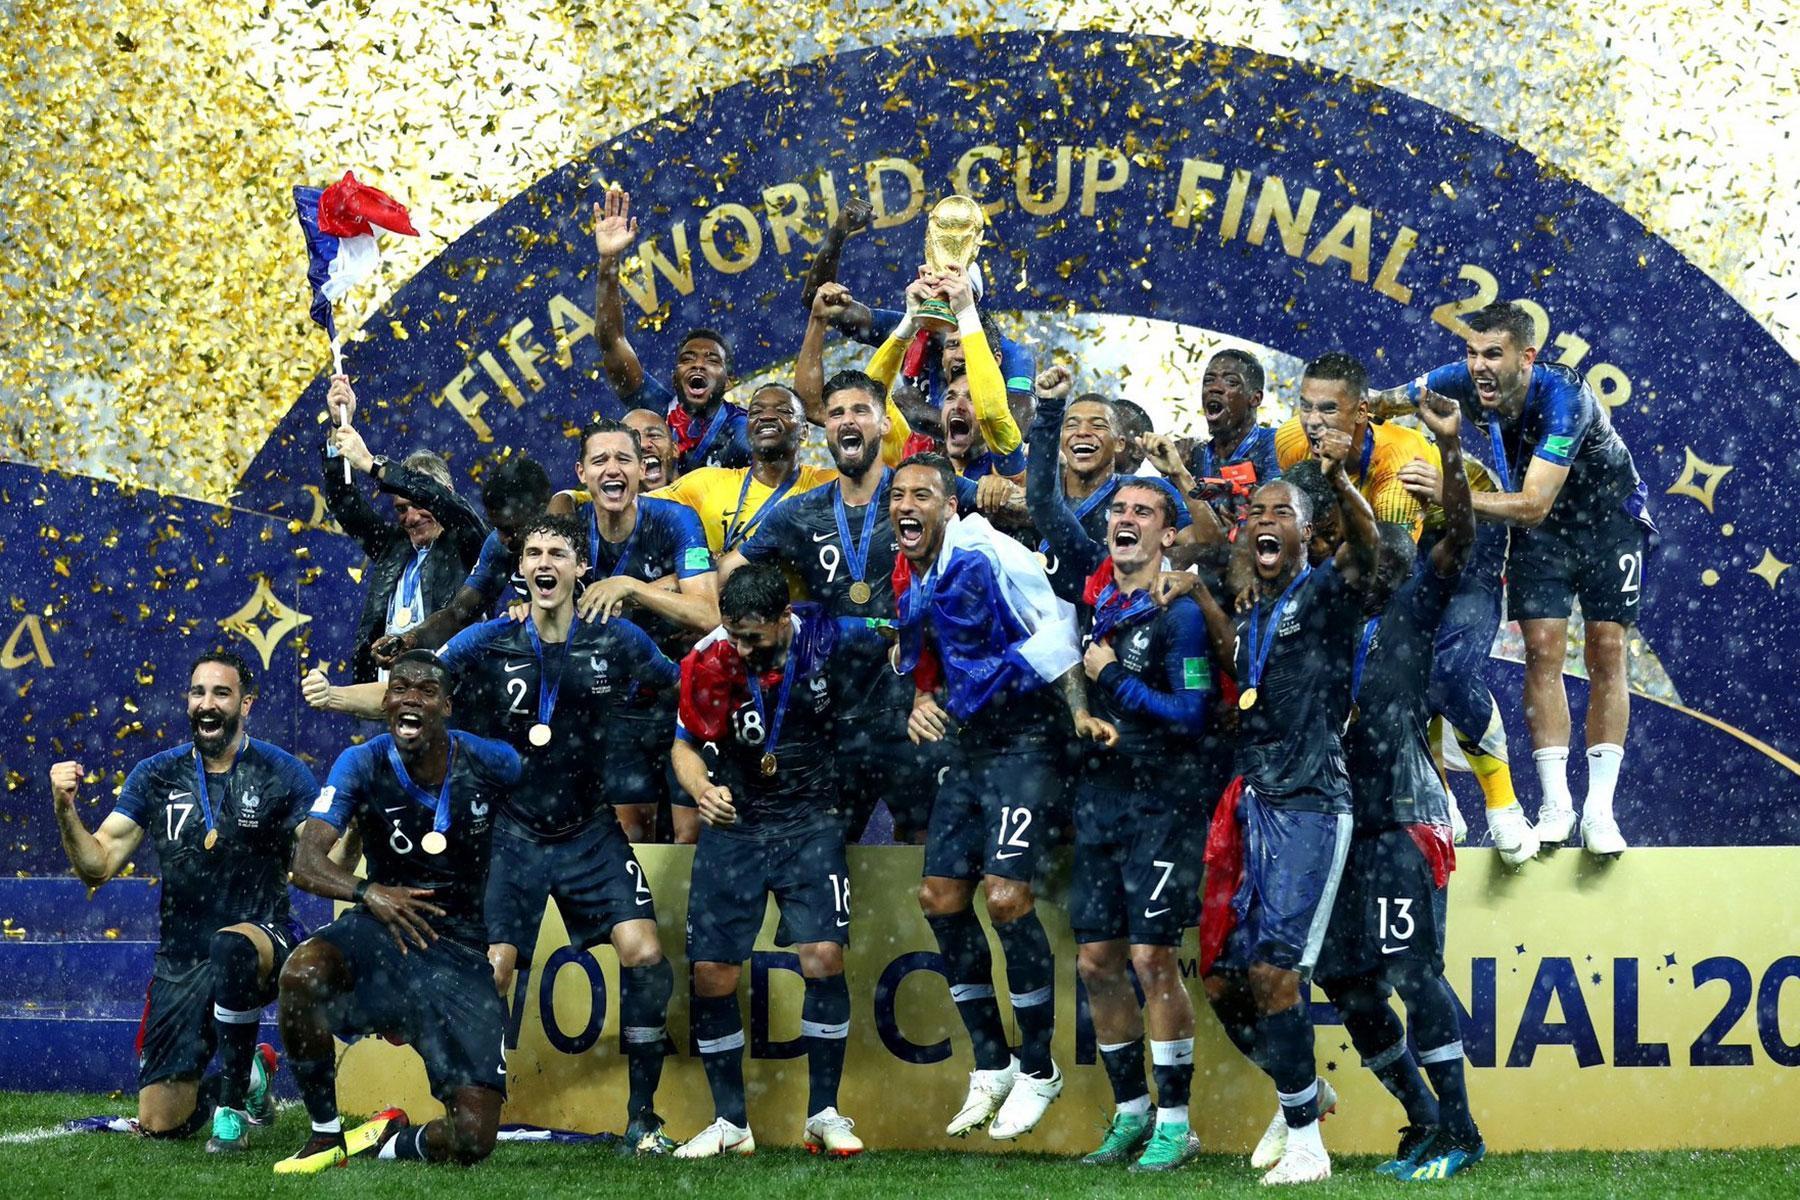 Žreb kvalifikácie MS vo futbale 2022